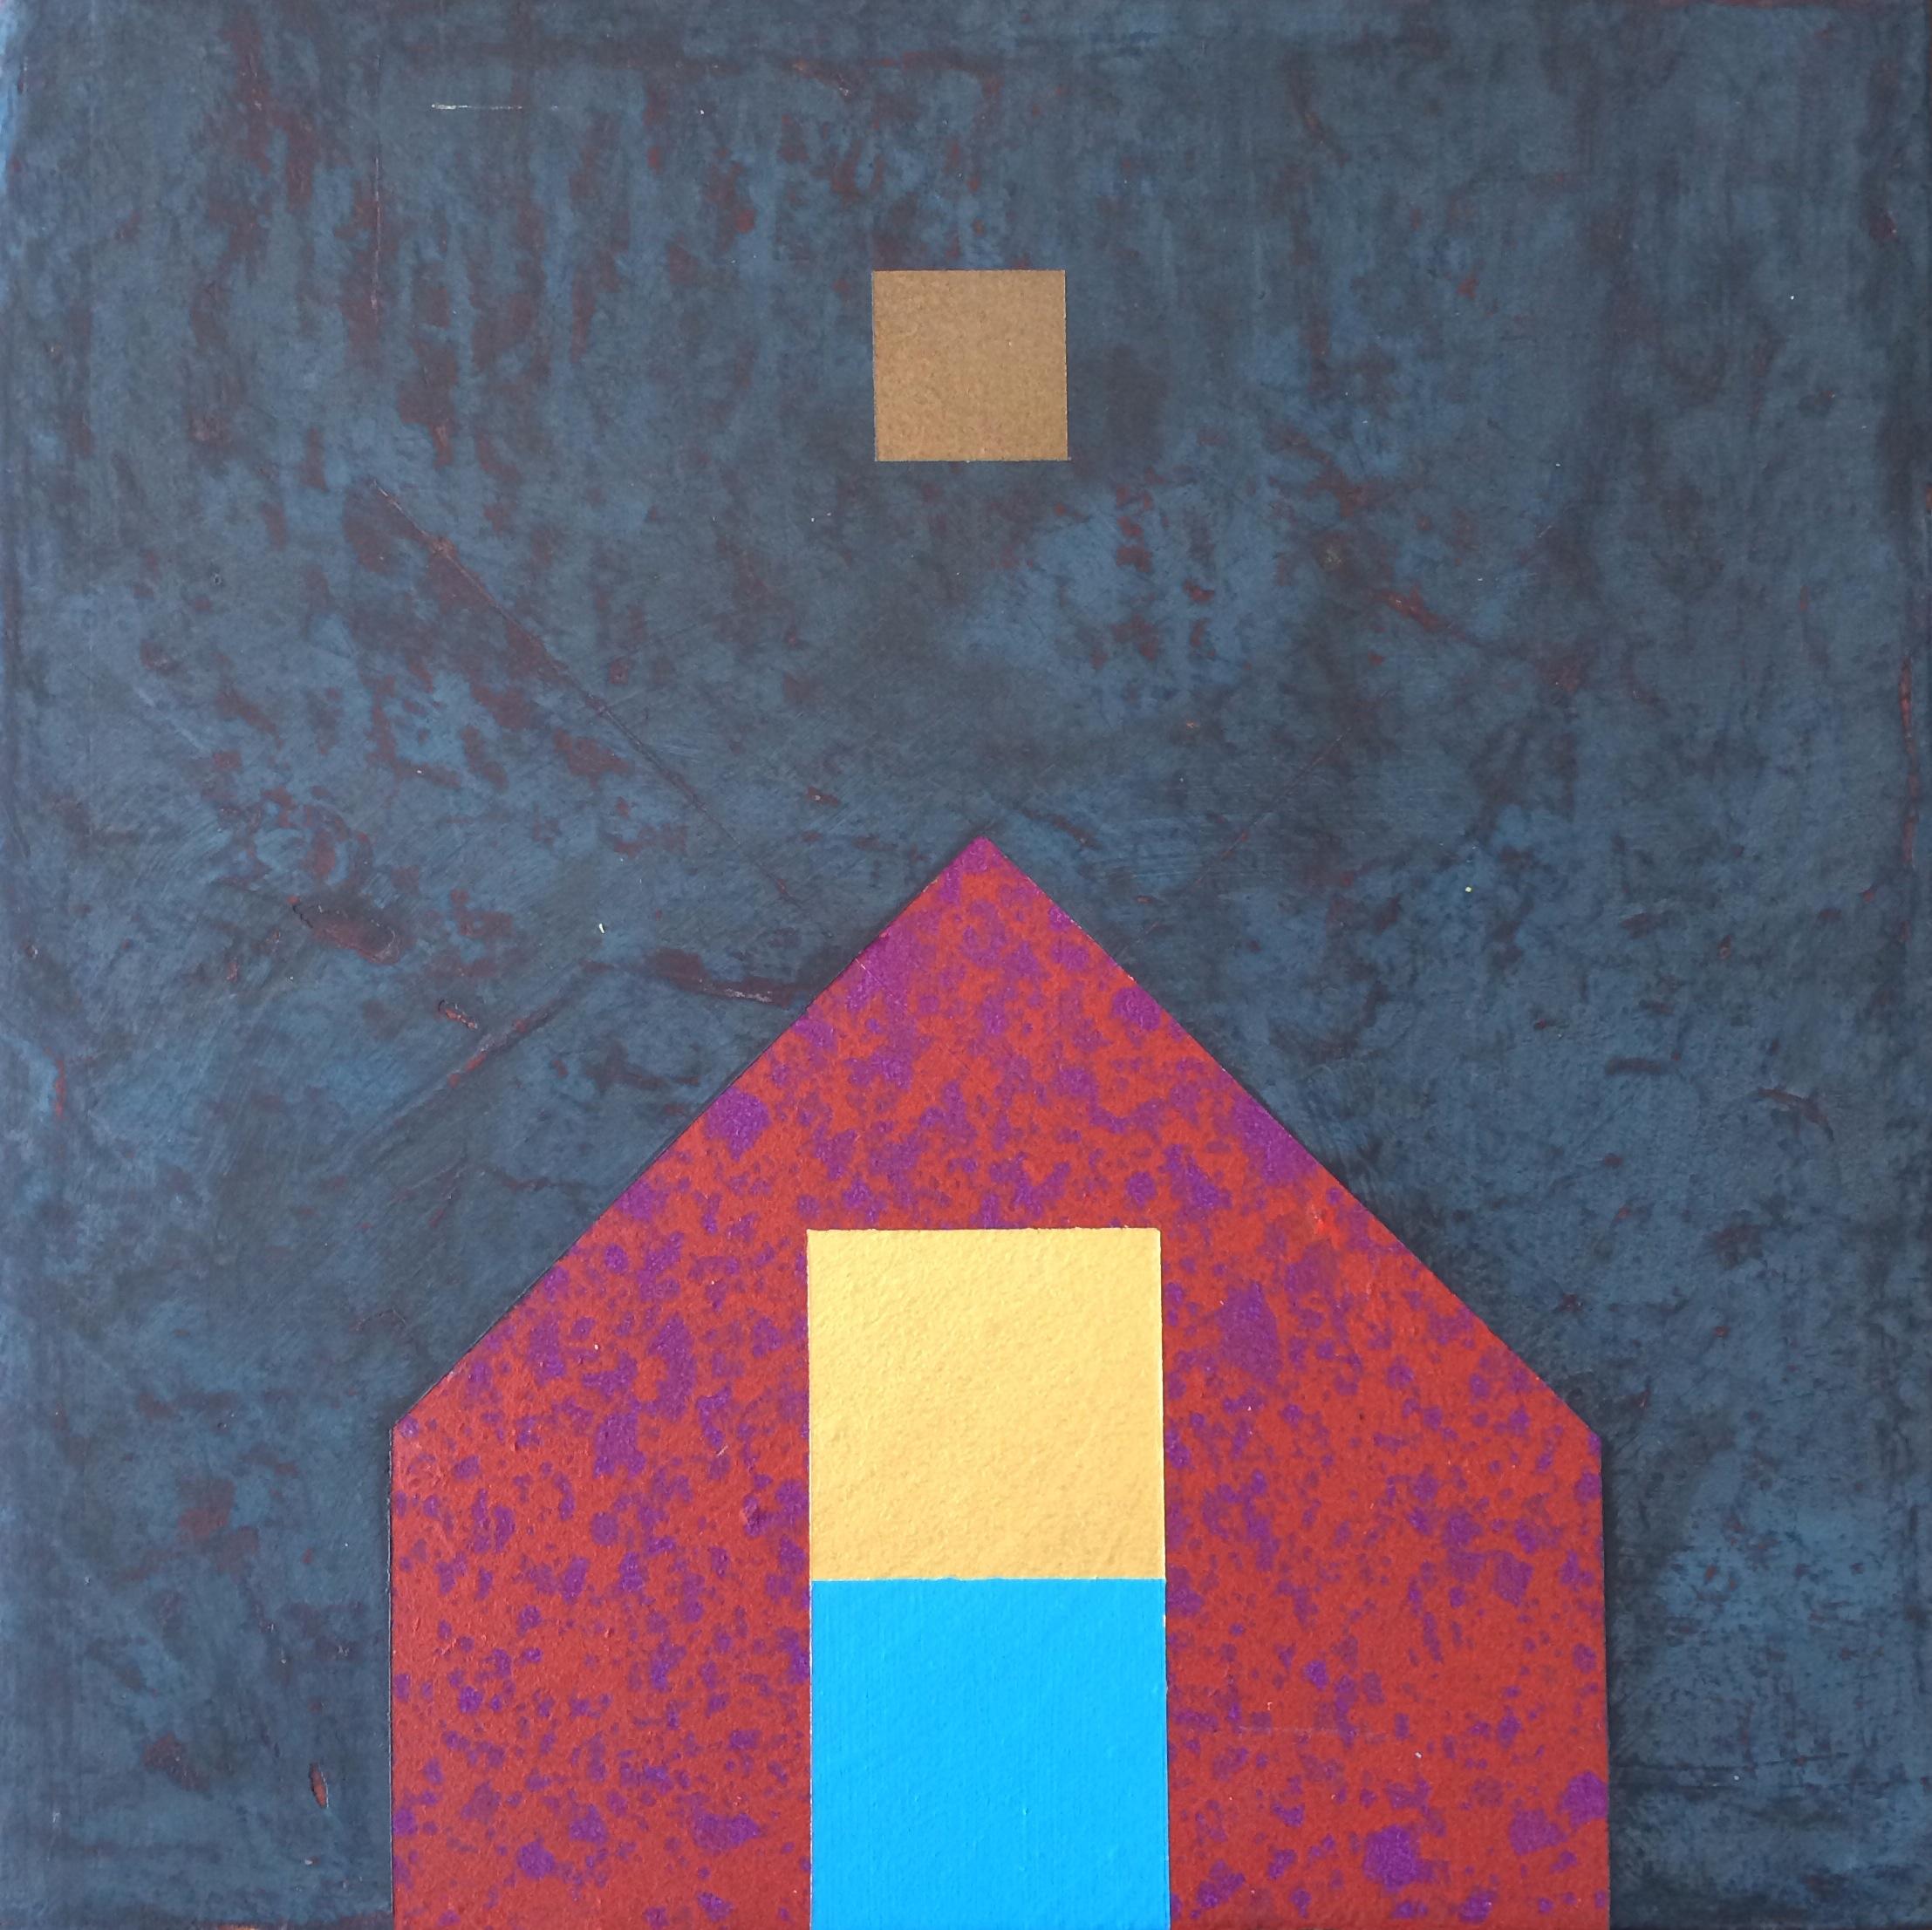 """ Morning Moon."" Brad Wreyford. Acrylic on canvas, 11"" X 11"". Value: $400.00."